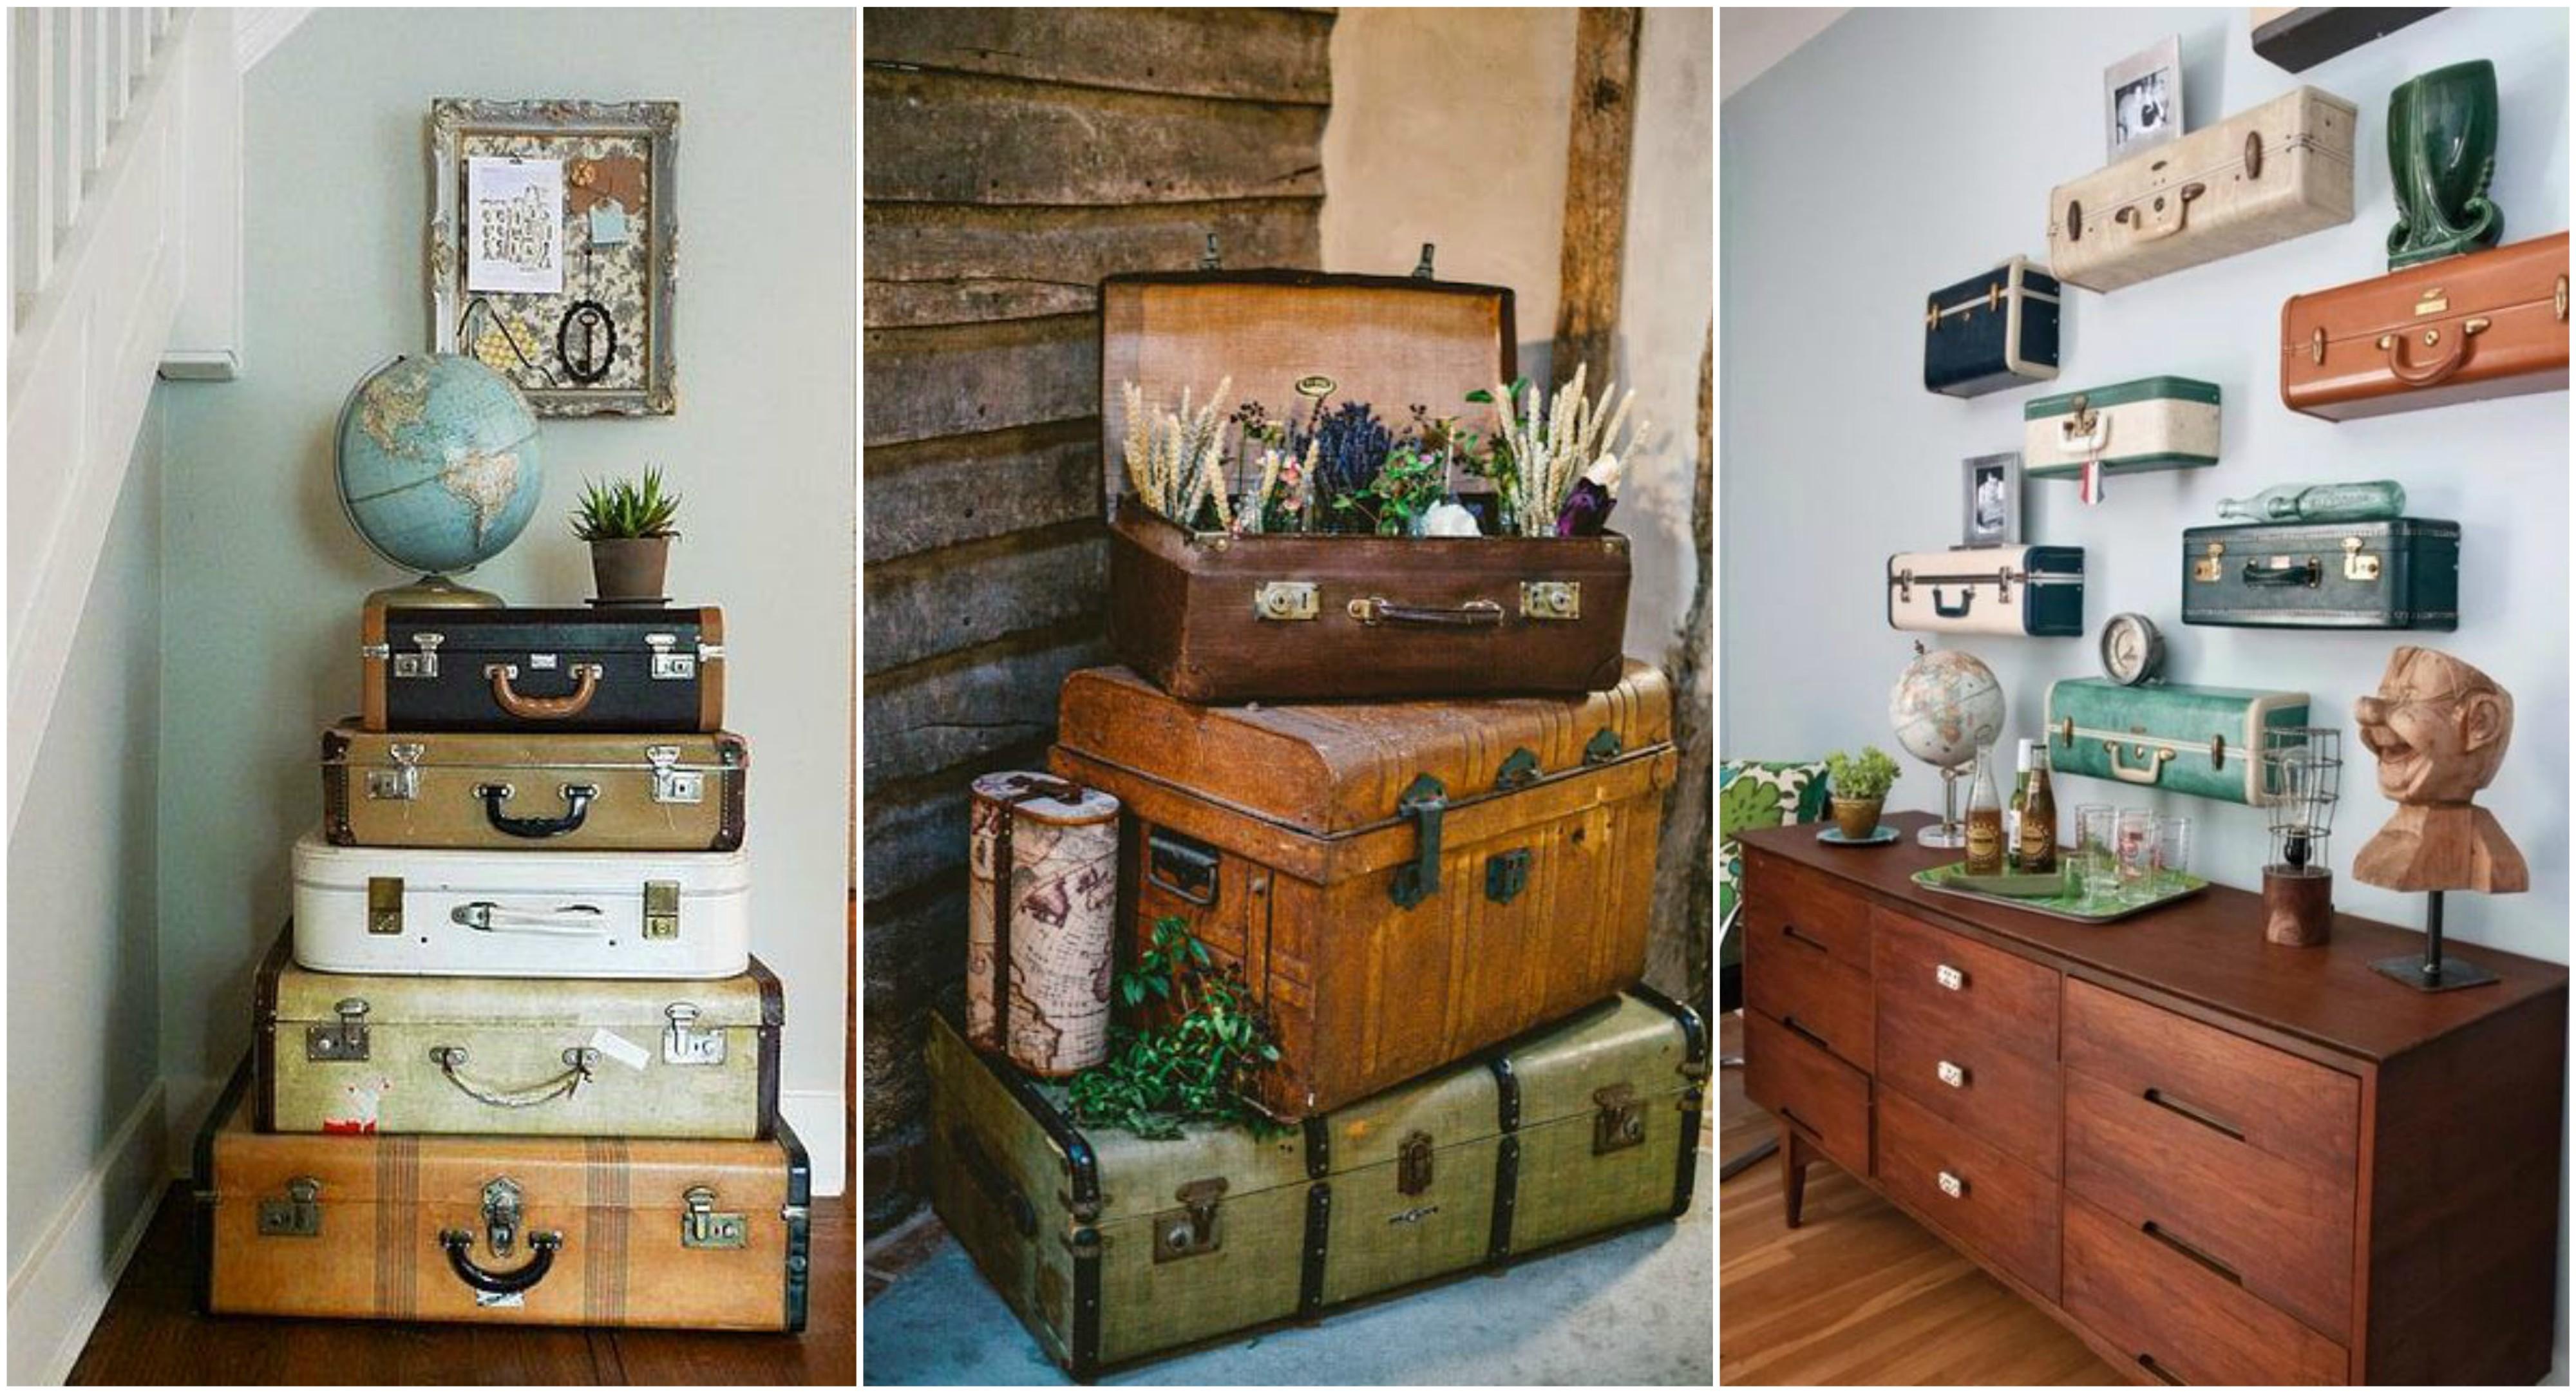 Alte koffer tolle wohndeko ideen - Wohndeko ideen ...